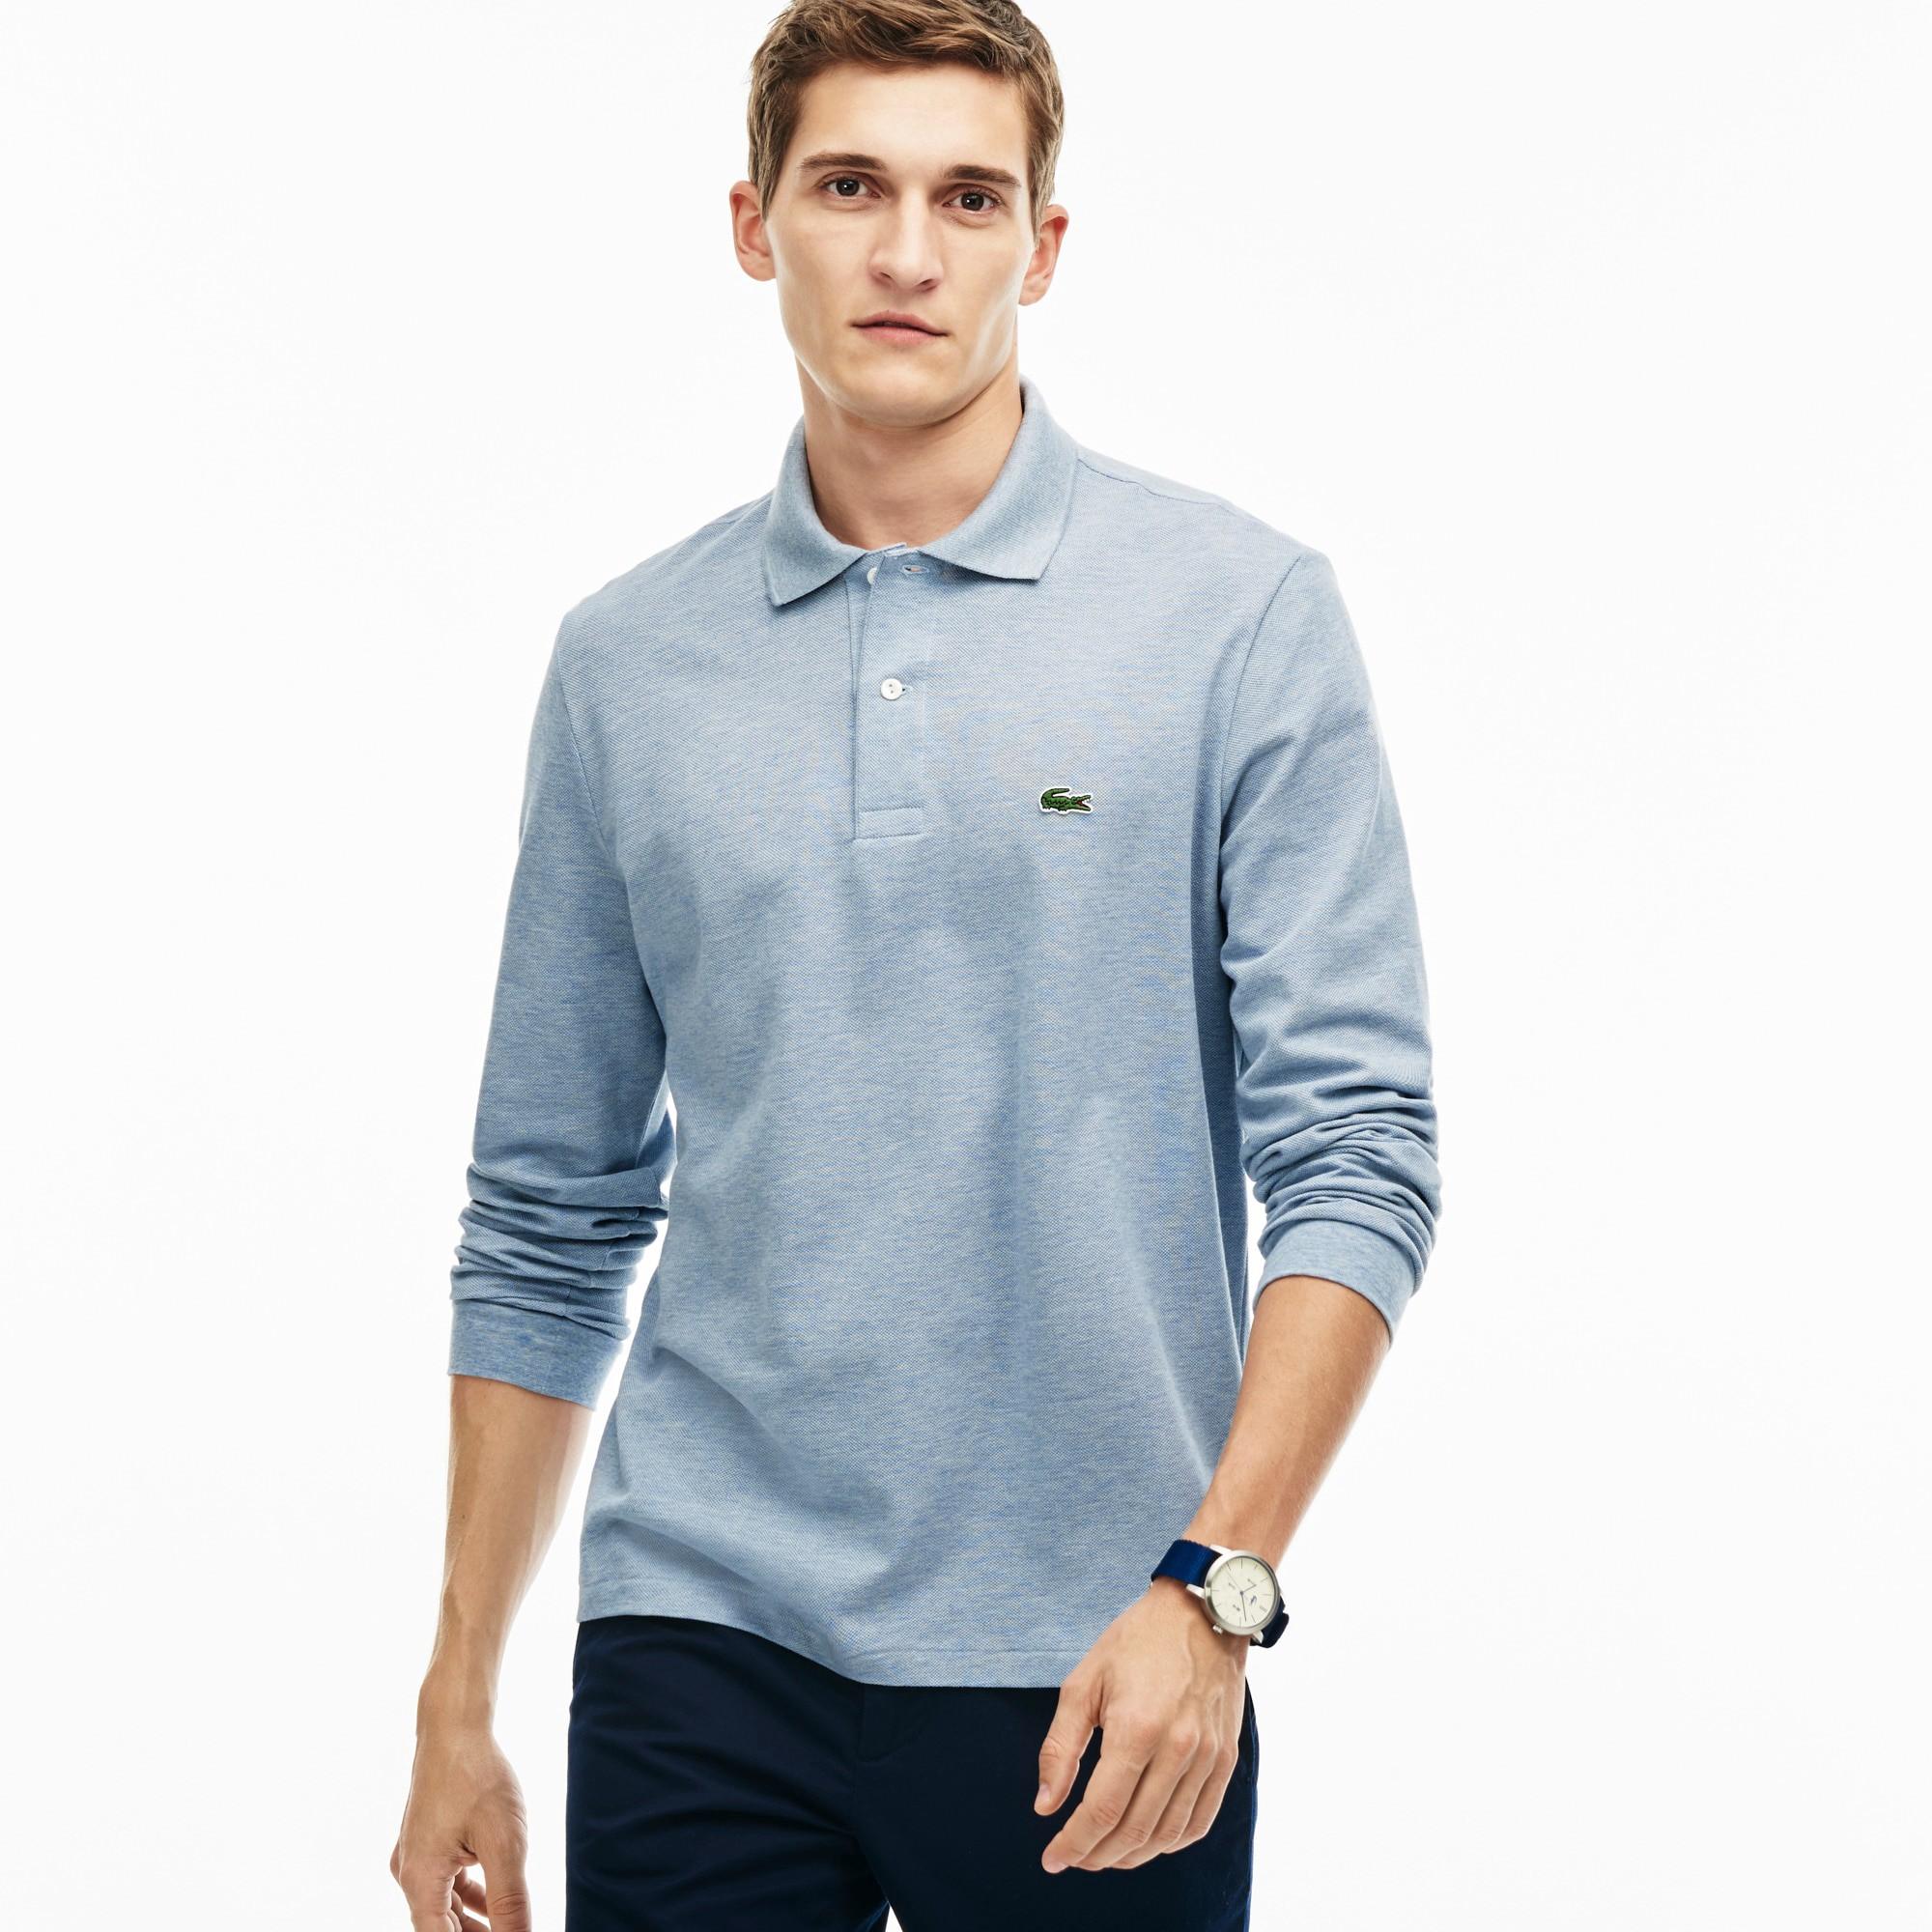 Men's Long Sleeve Chine Piqué Polo Shirt - Celestial Chine 99h